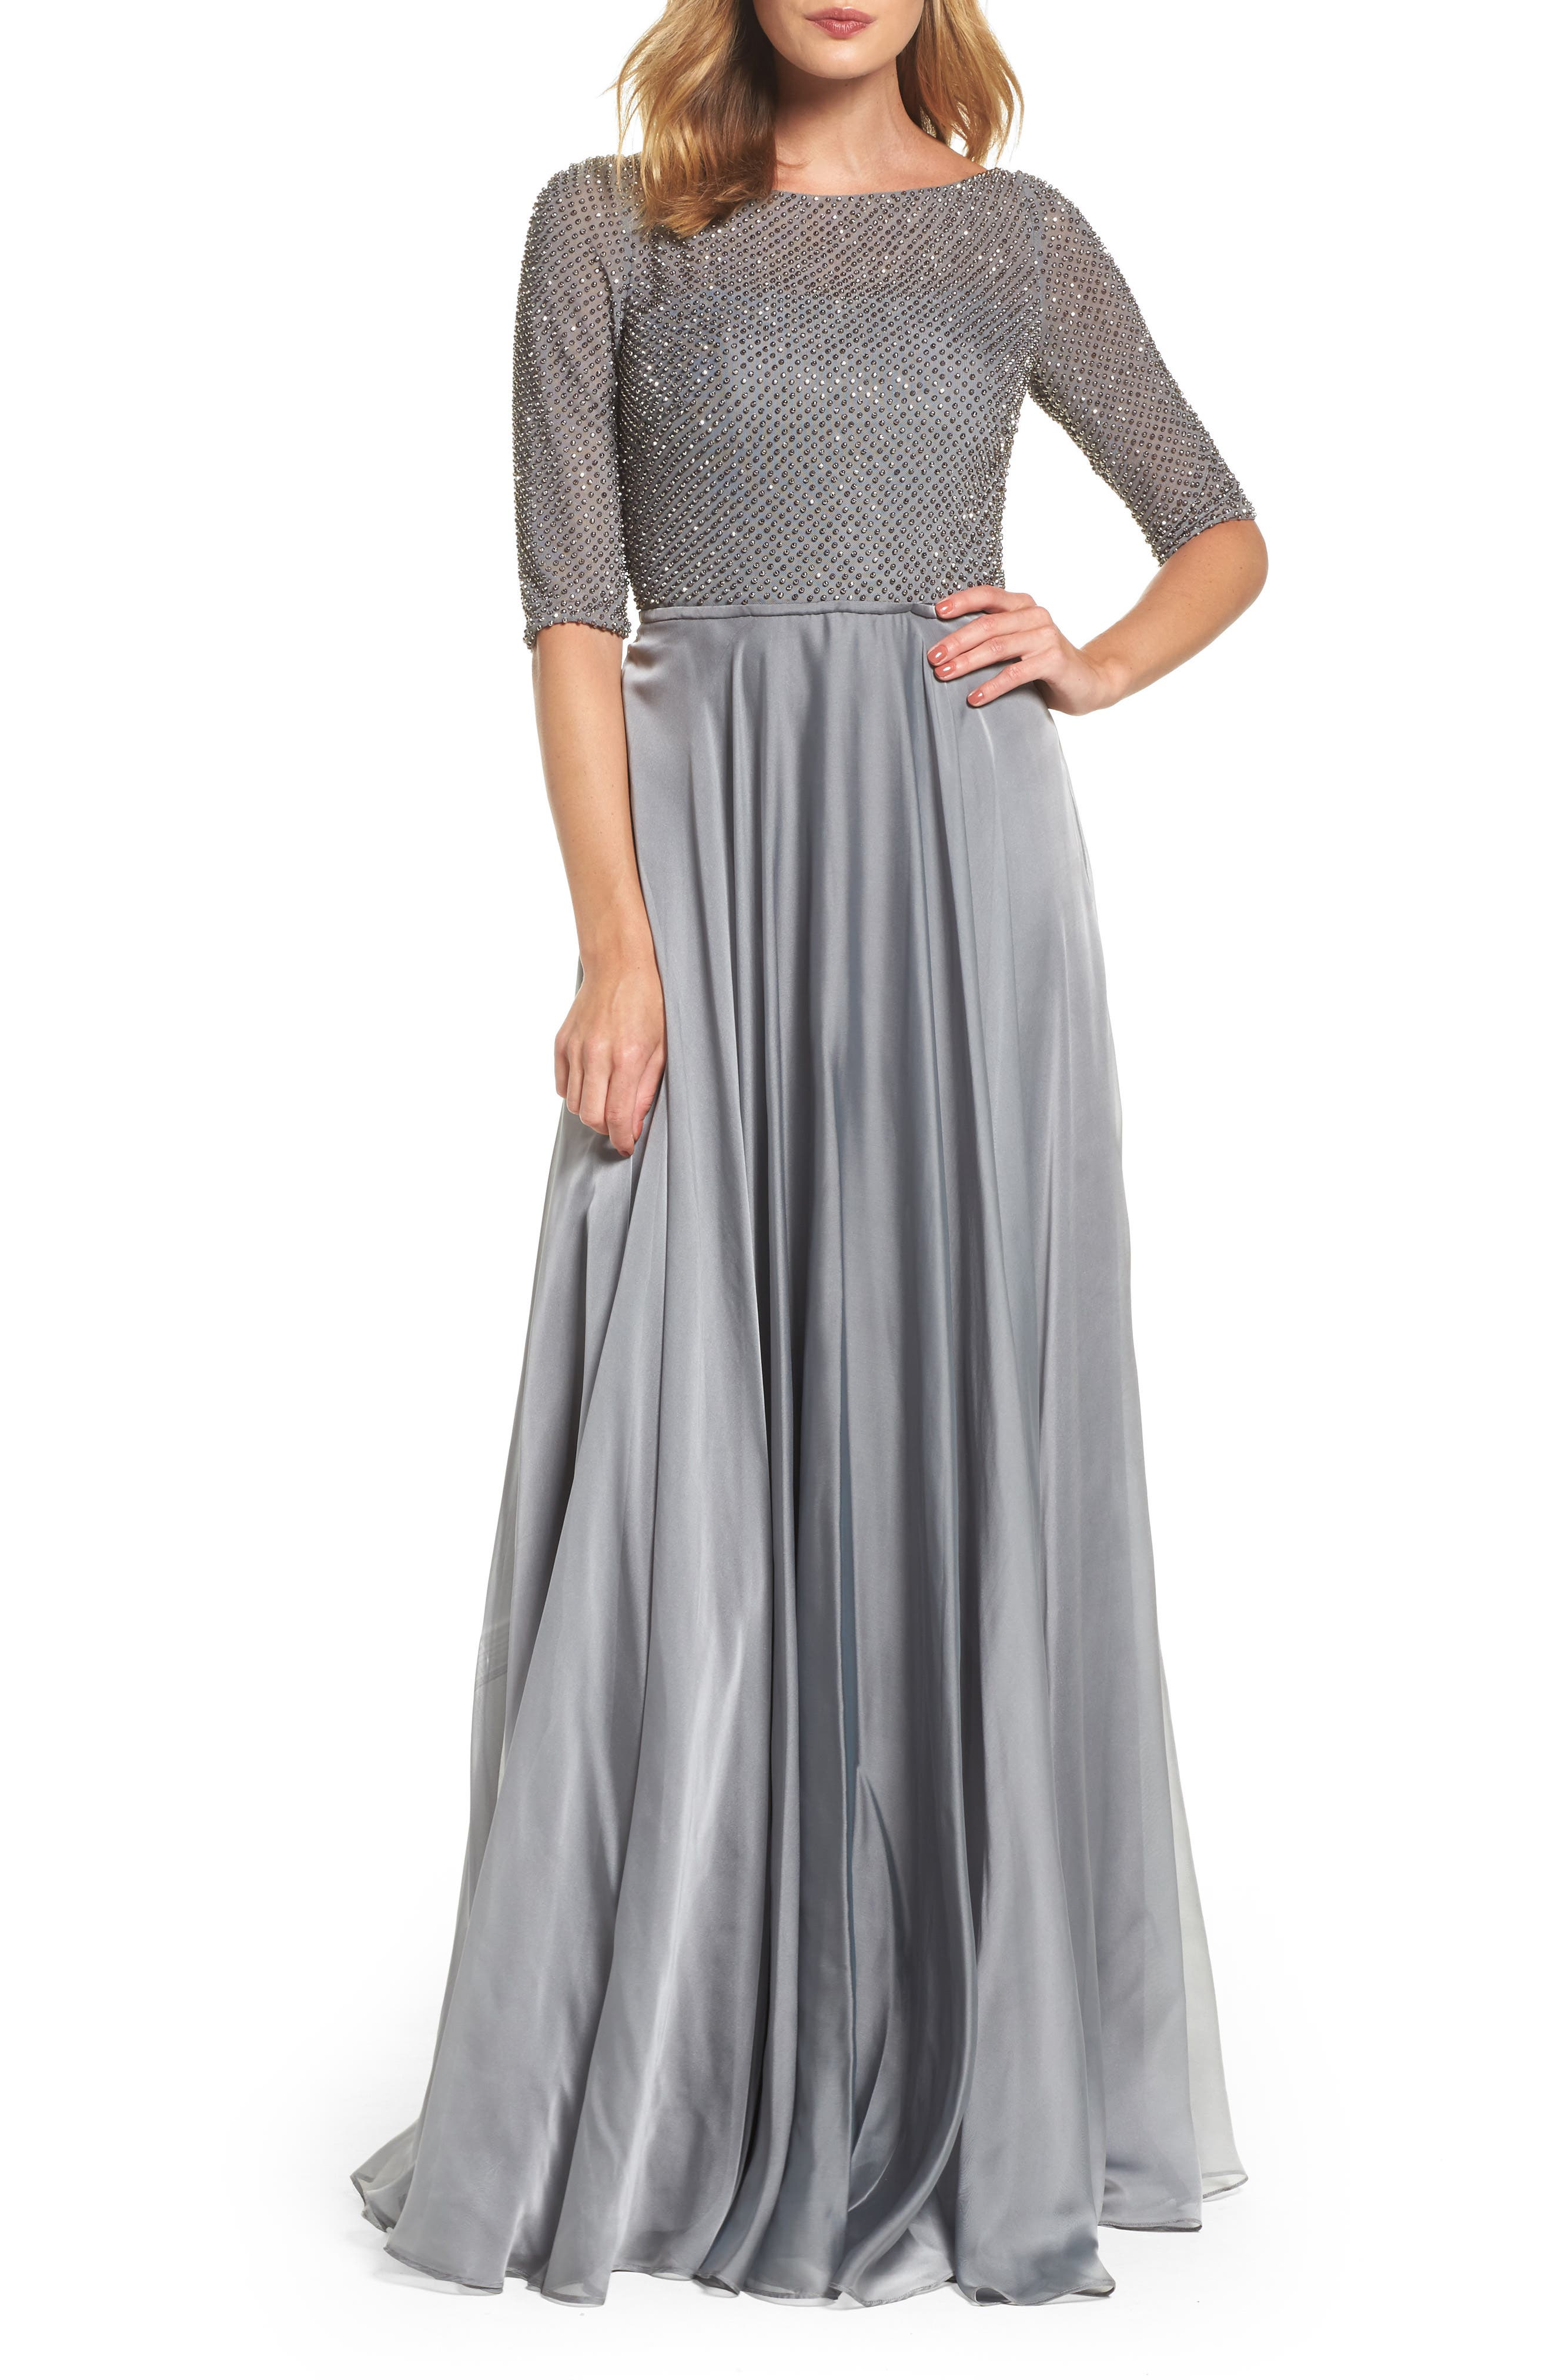 La Femme Embellished Bodice Gown, Metallic